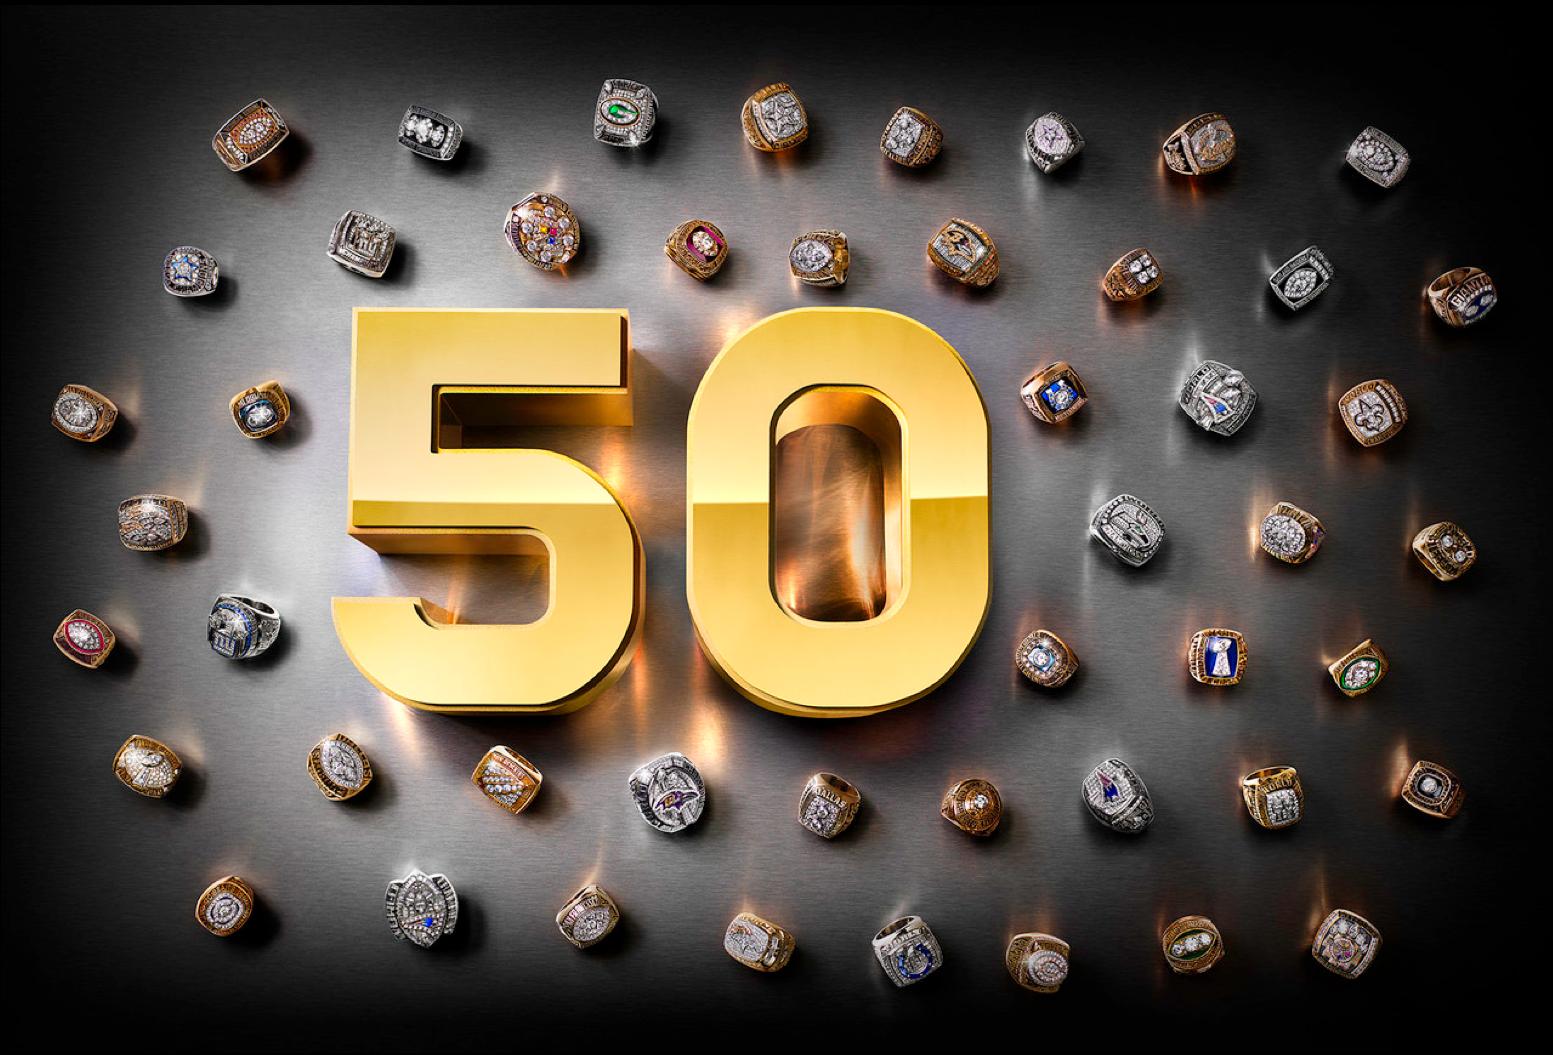 12-Super Bowl Rings-50th